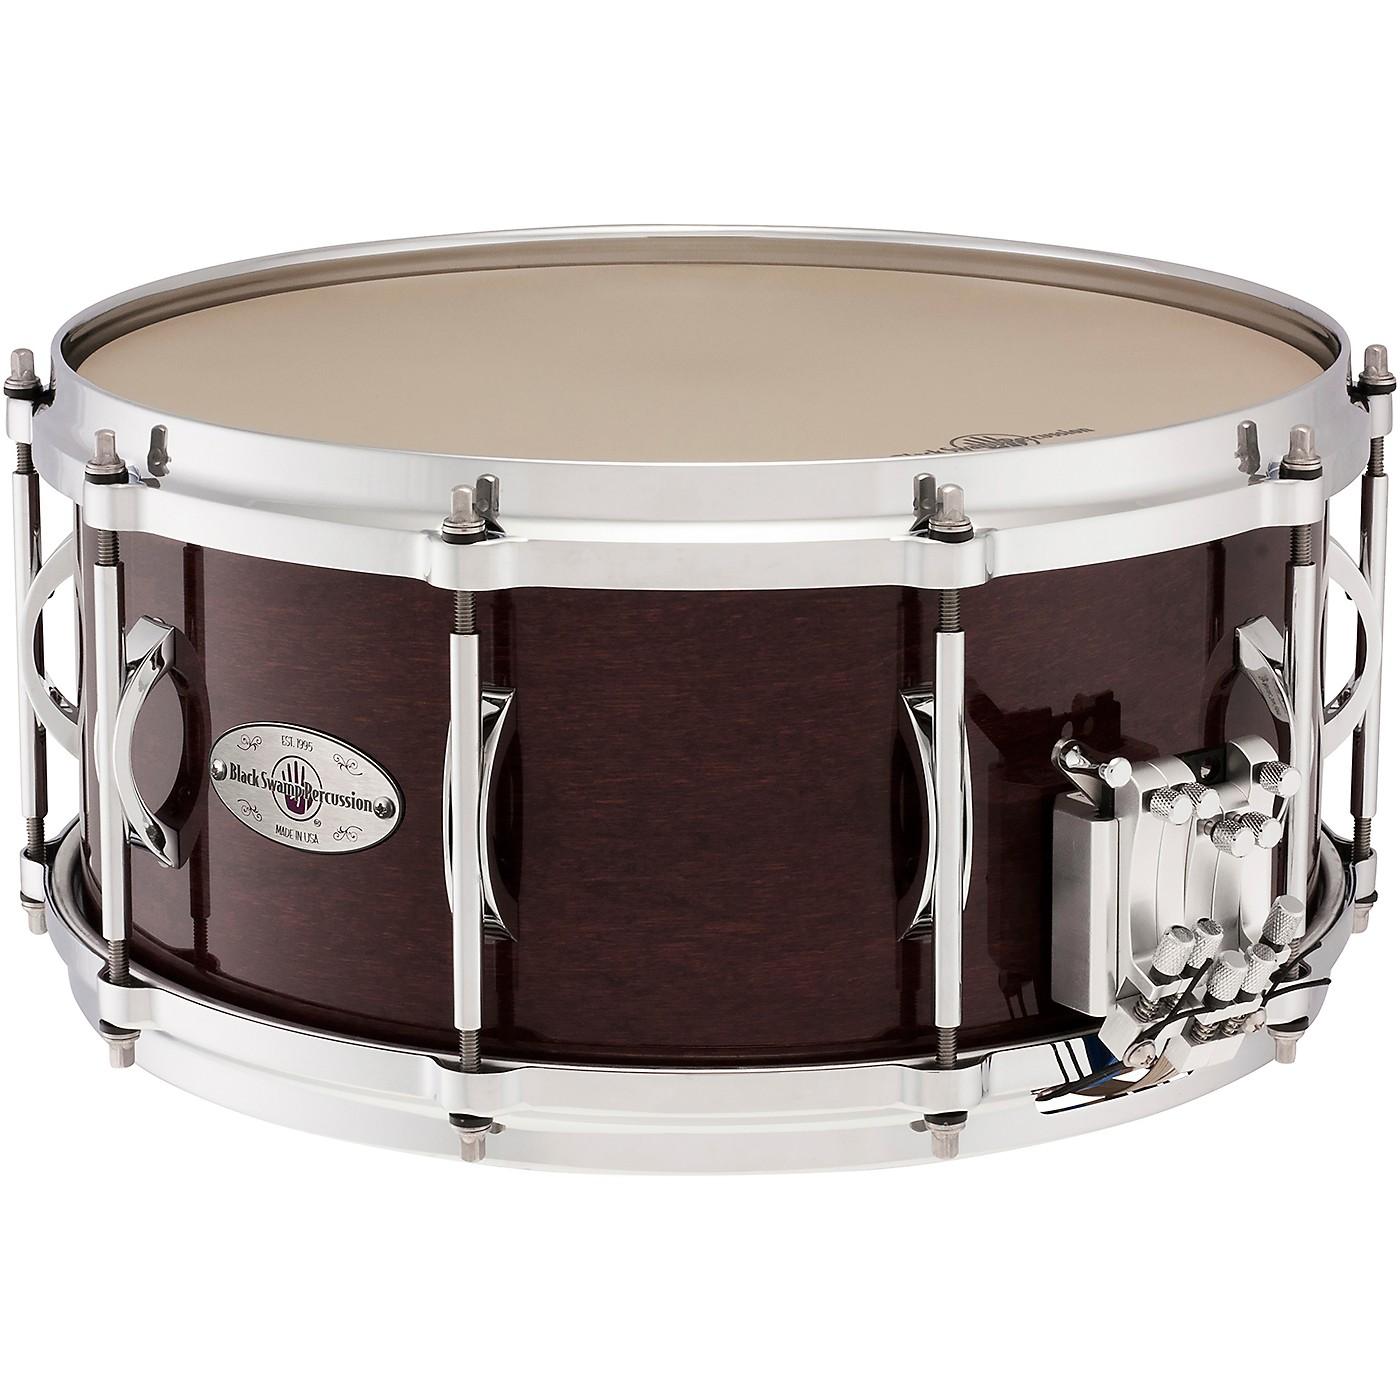 Black Swamp Percussion Multisonic Concert Maple Snare Drum thumbnail